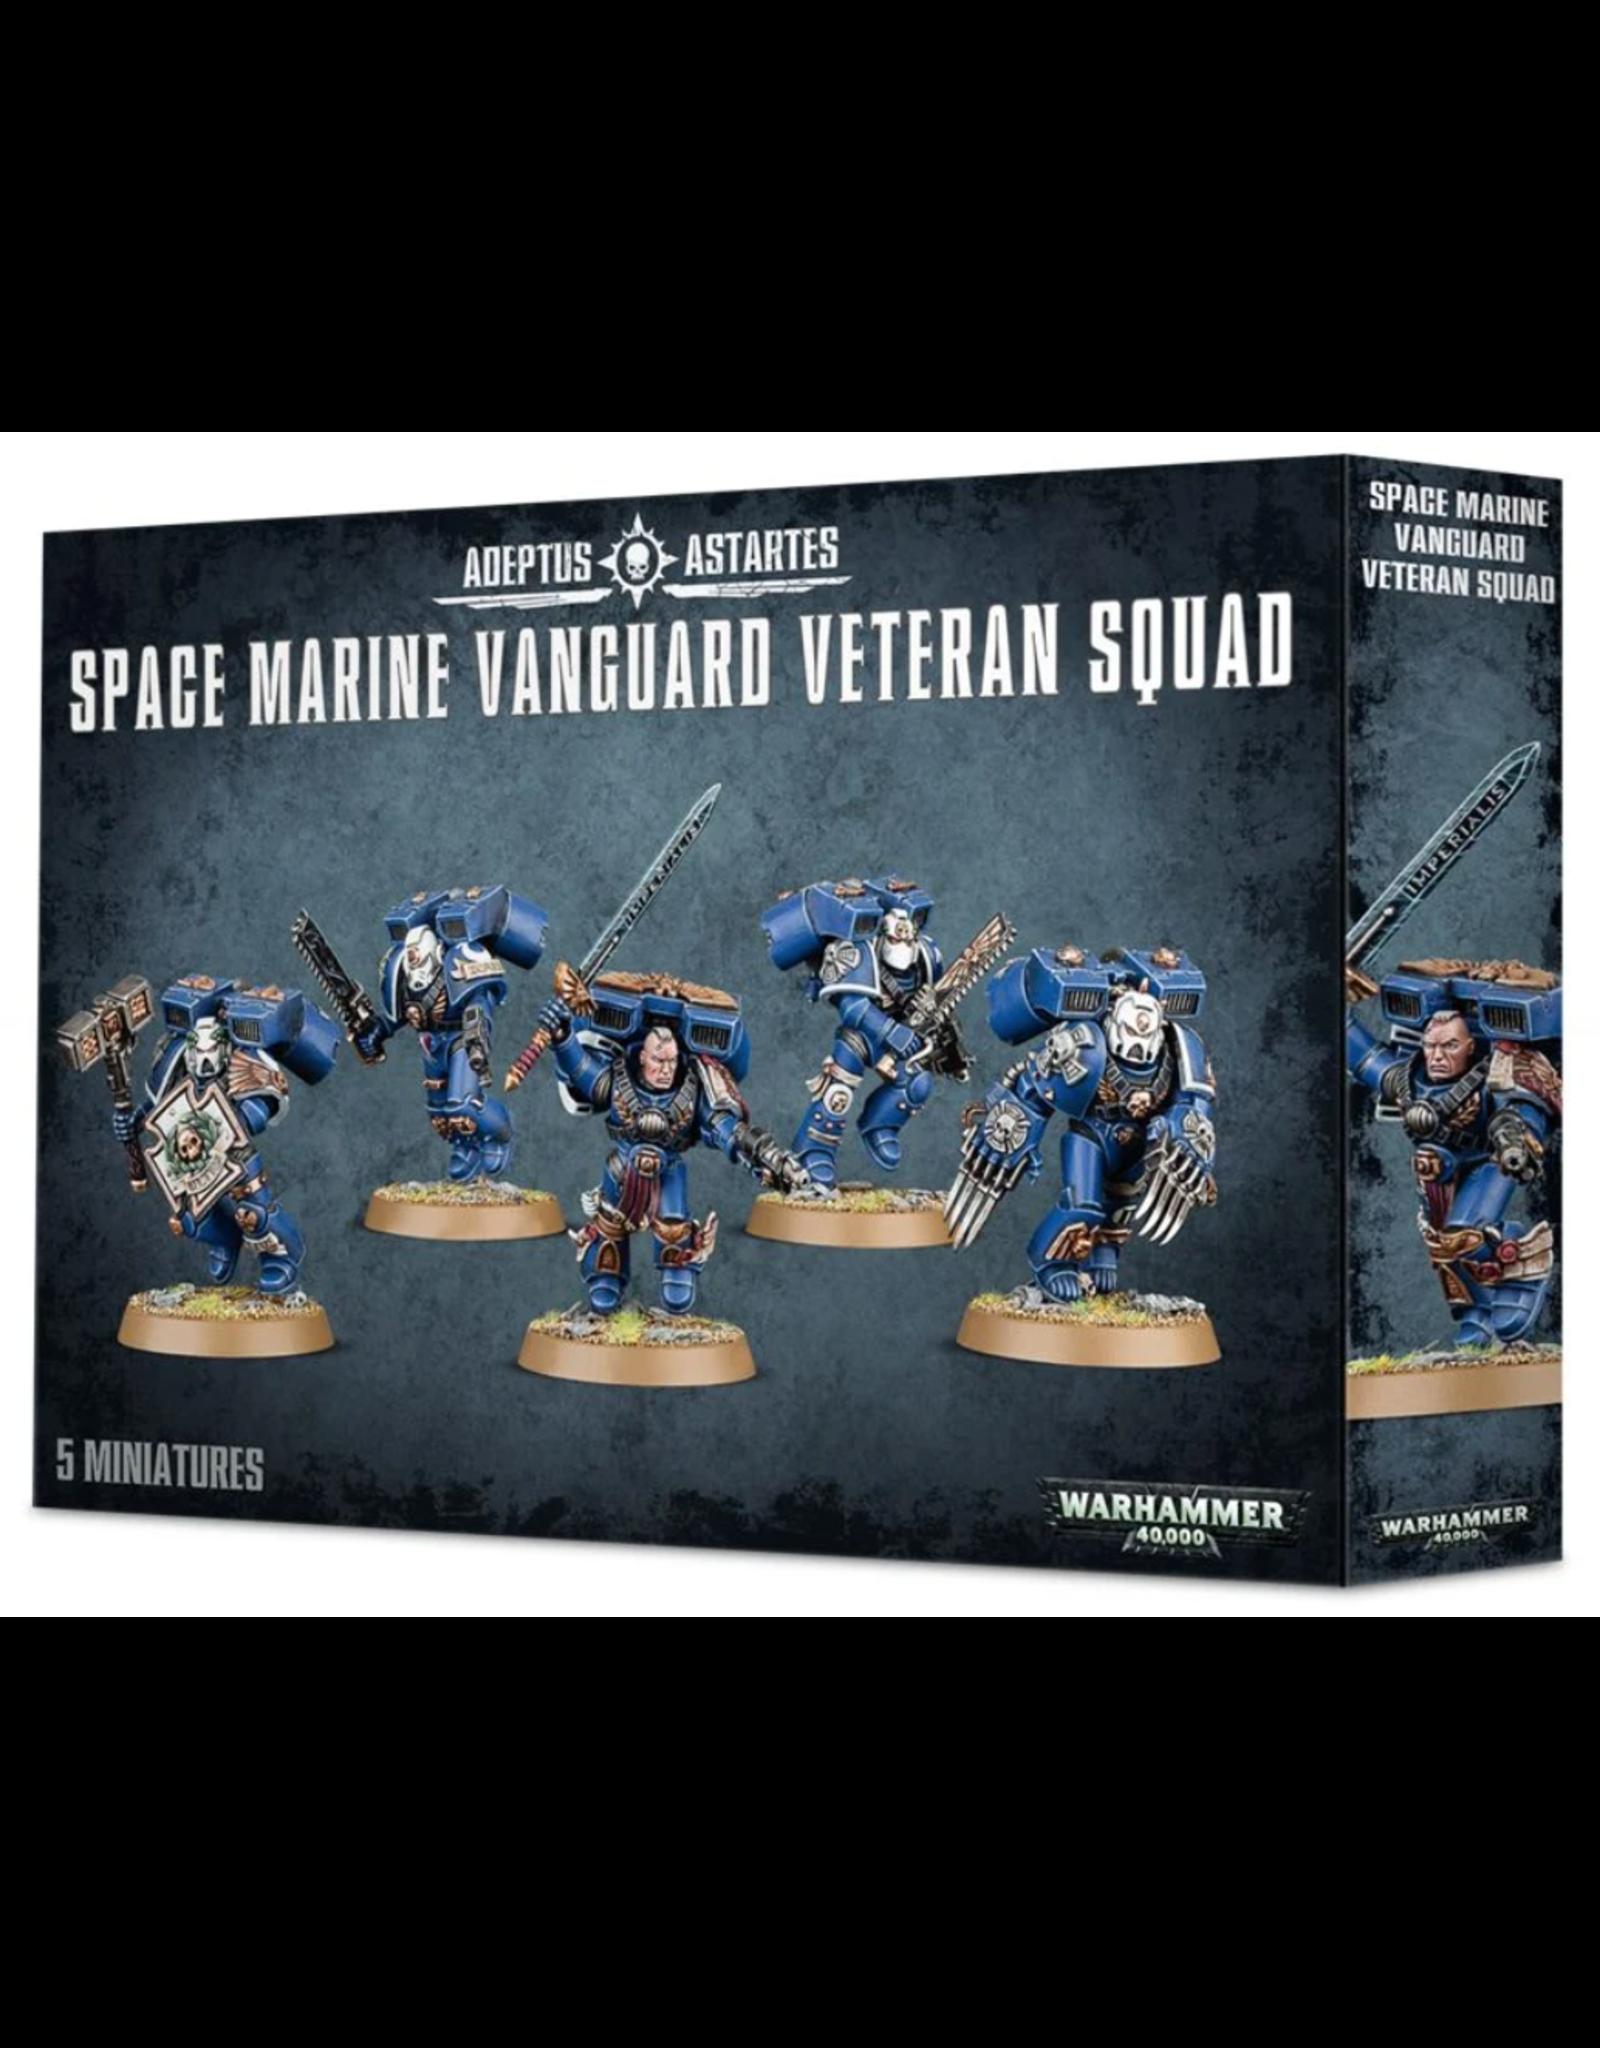 Warhammer 40K Space Marine Vanguard Veteran Squad